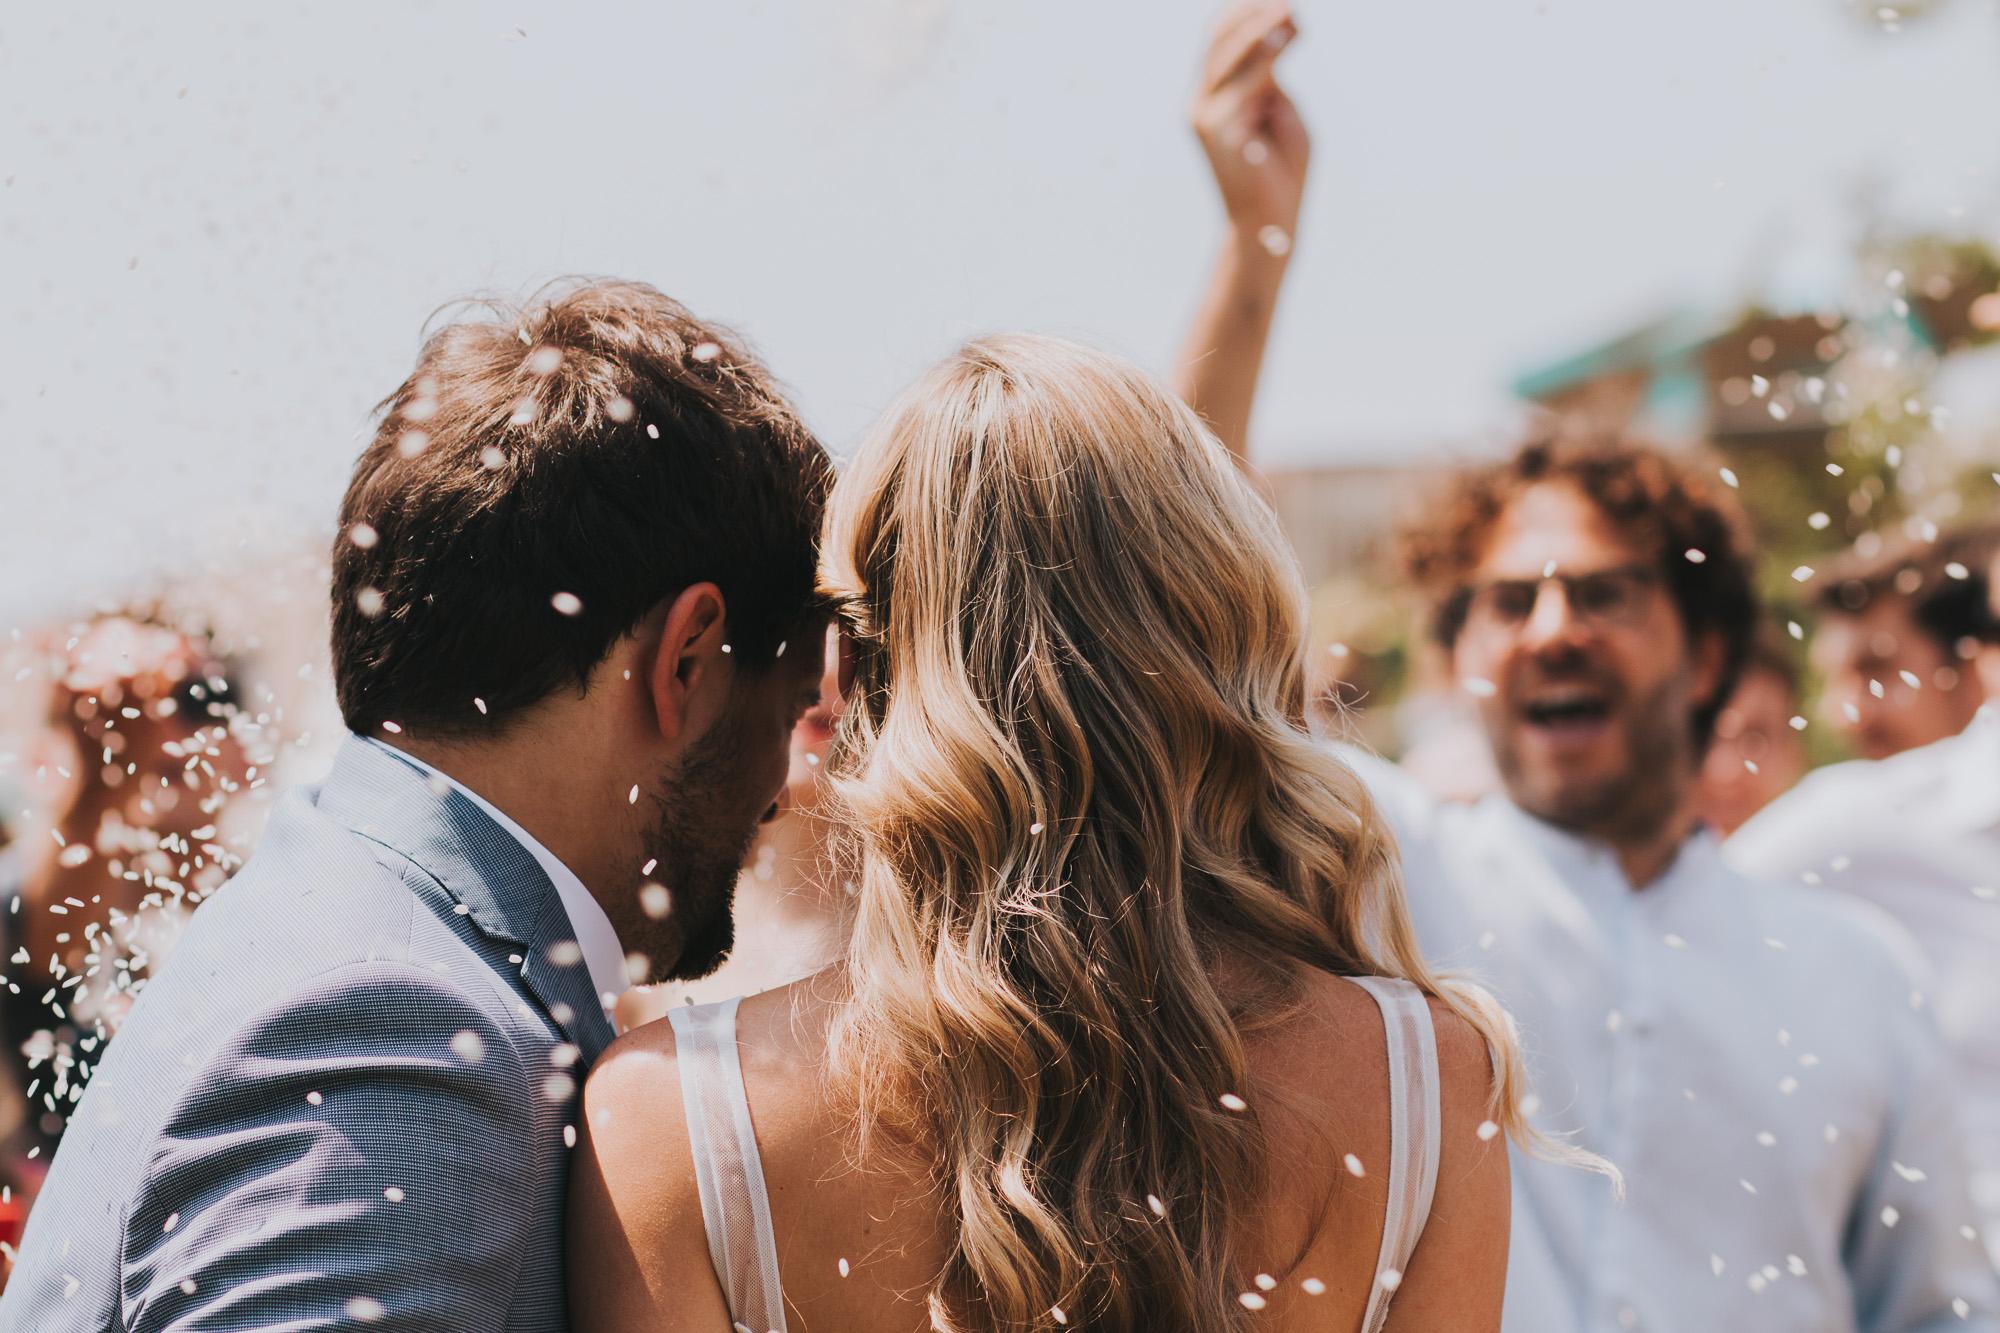 20180720-Memoryfactory-Sara&Jacopo-54- Hochzeit.jpg